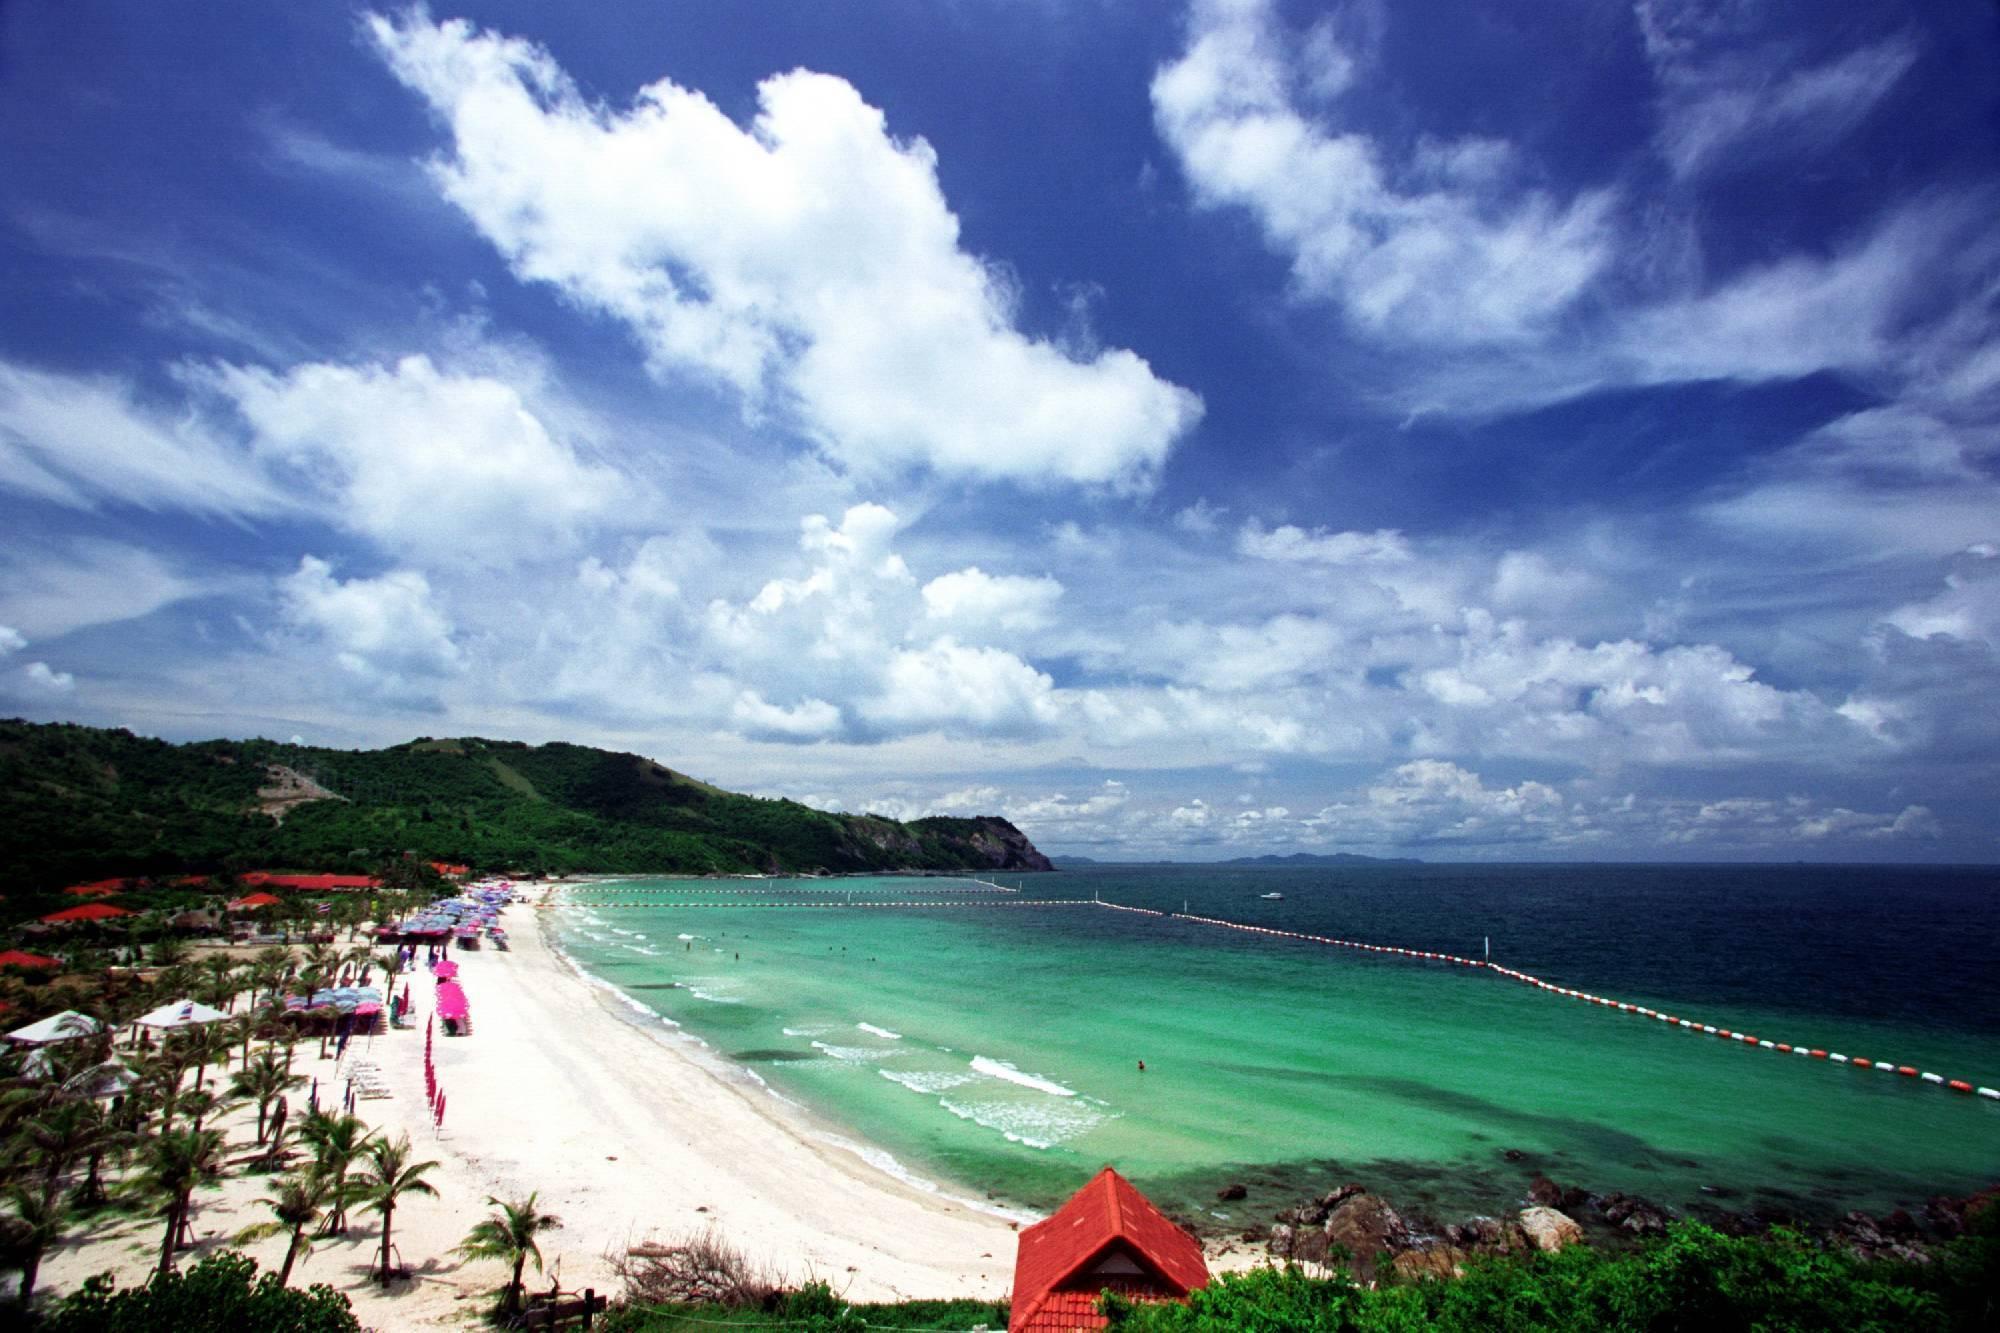 Фото туристов с пляжей тайланда